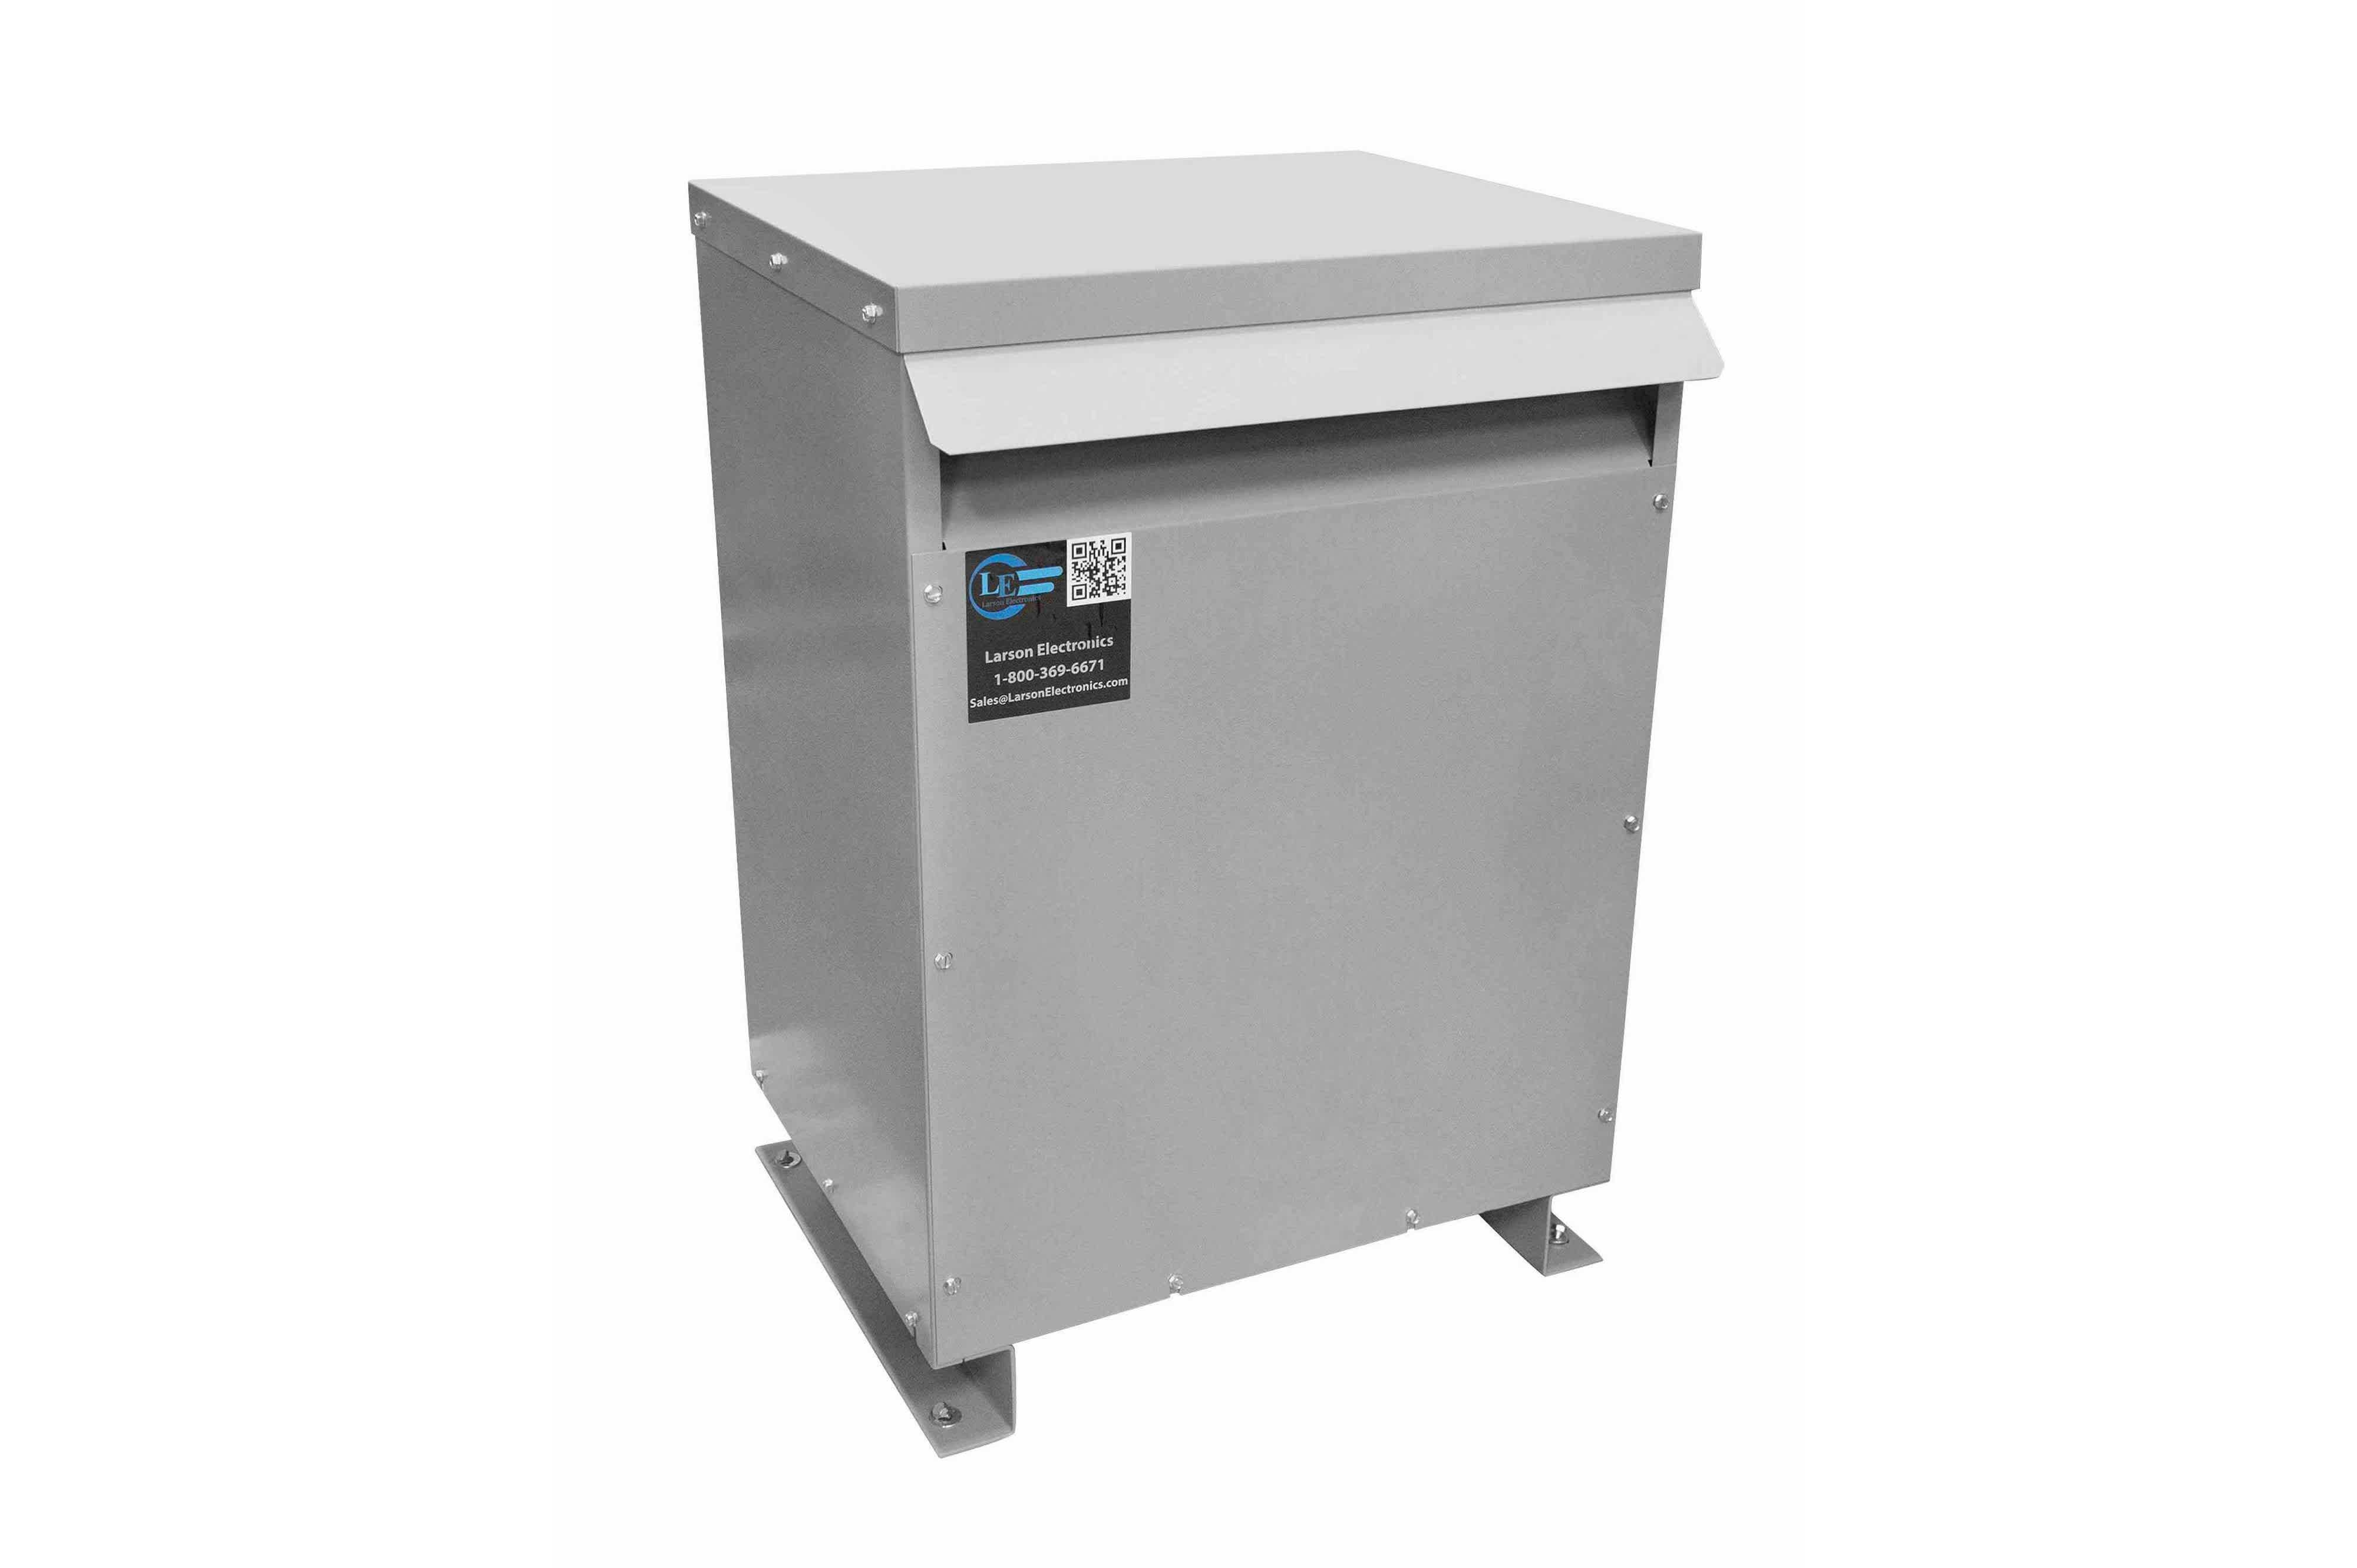 70 kVA 3PH Isolation Transformer, 600V Wye Primary, 240V Delta Secondary, N3R, Ventilated, 60 Hz